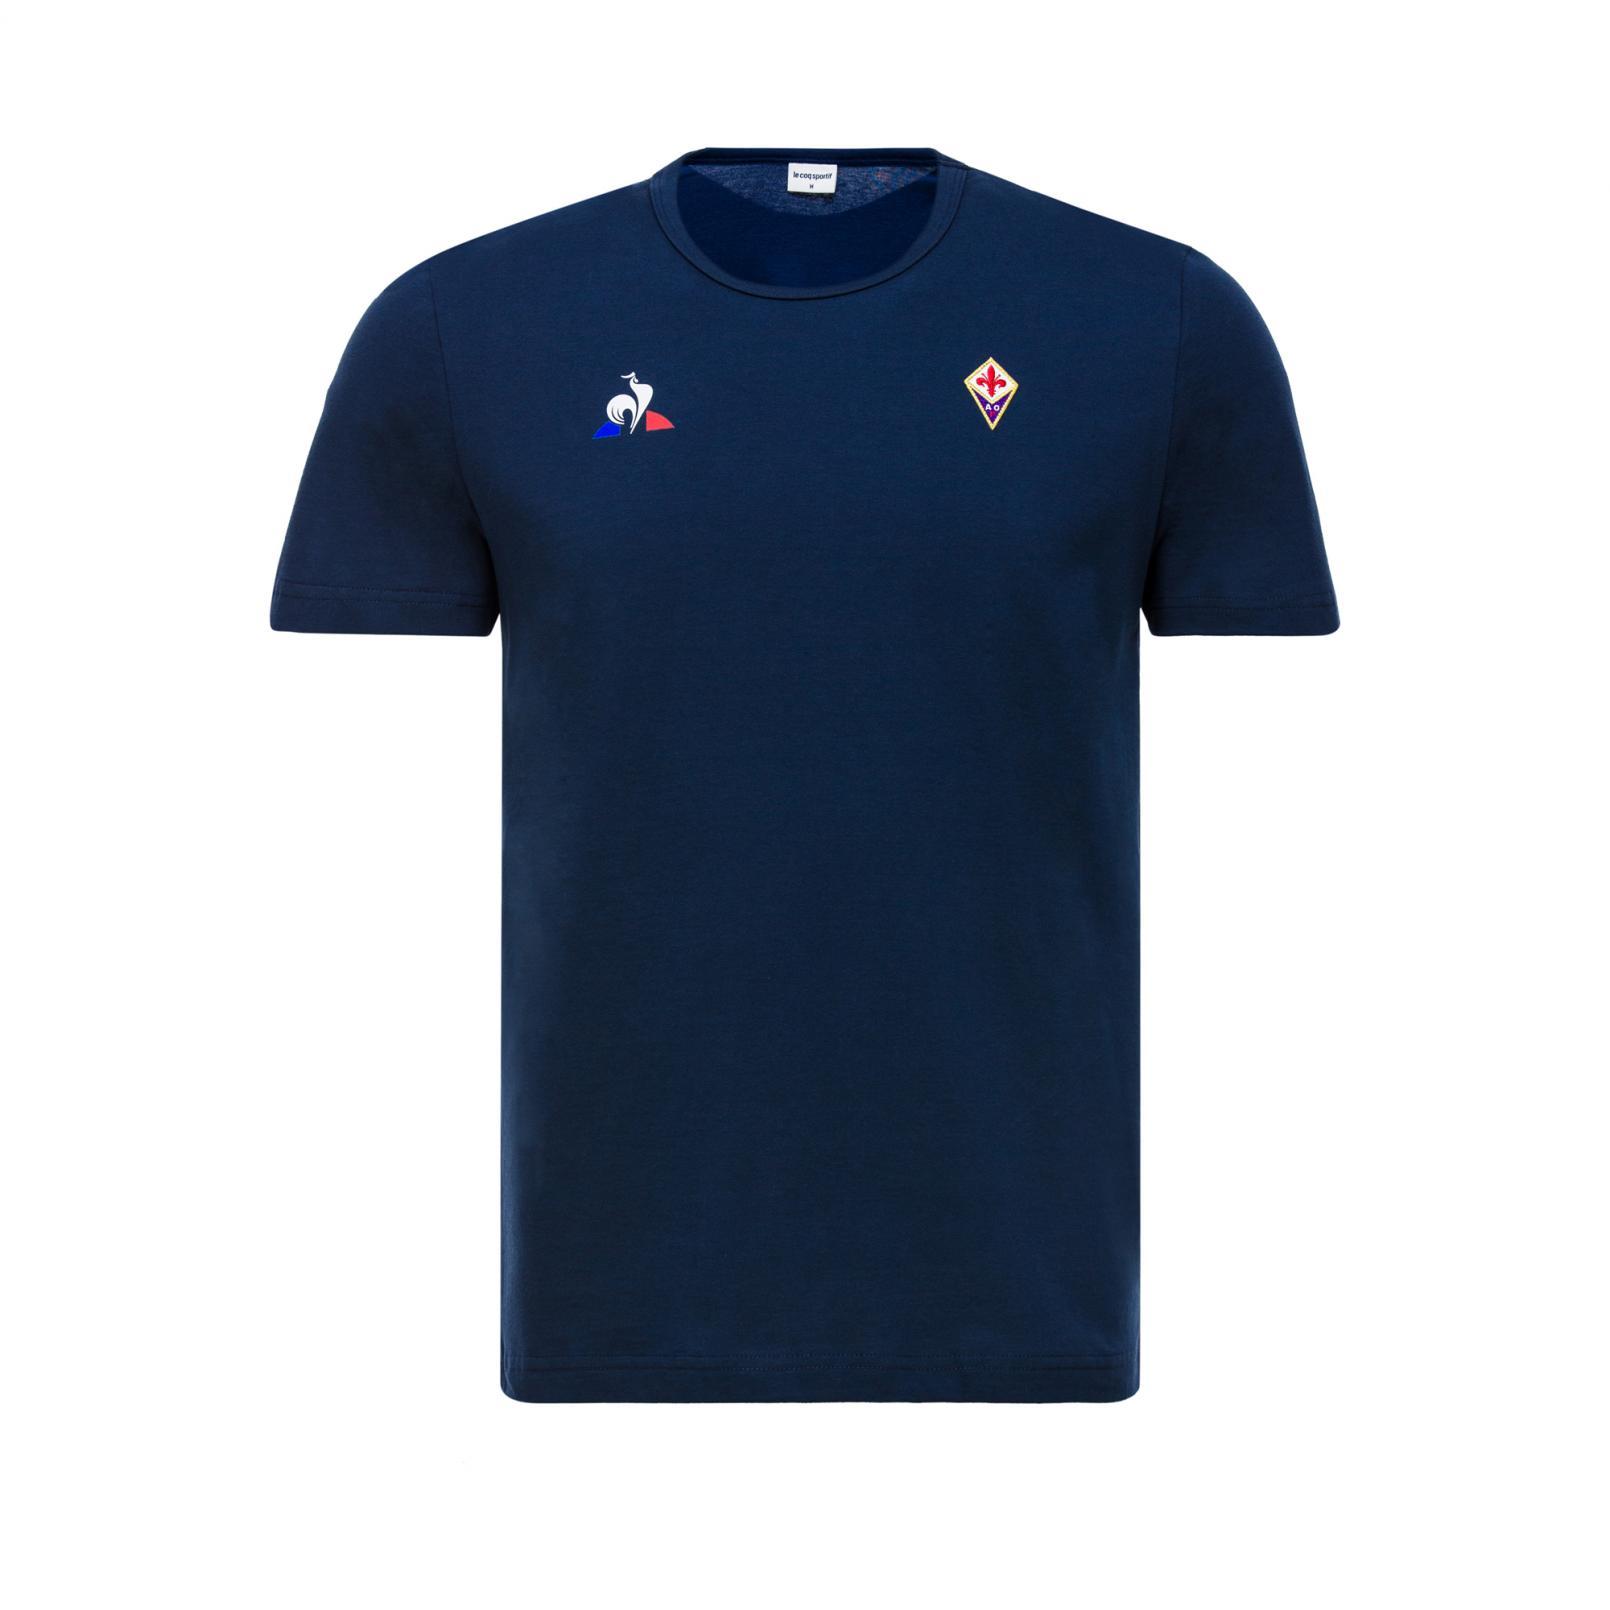 T-shirts – Le Coq Sportif Fiorentina Pres T-shirt Purple